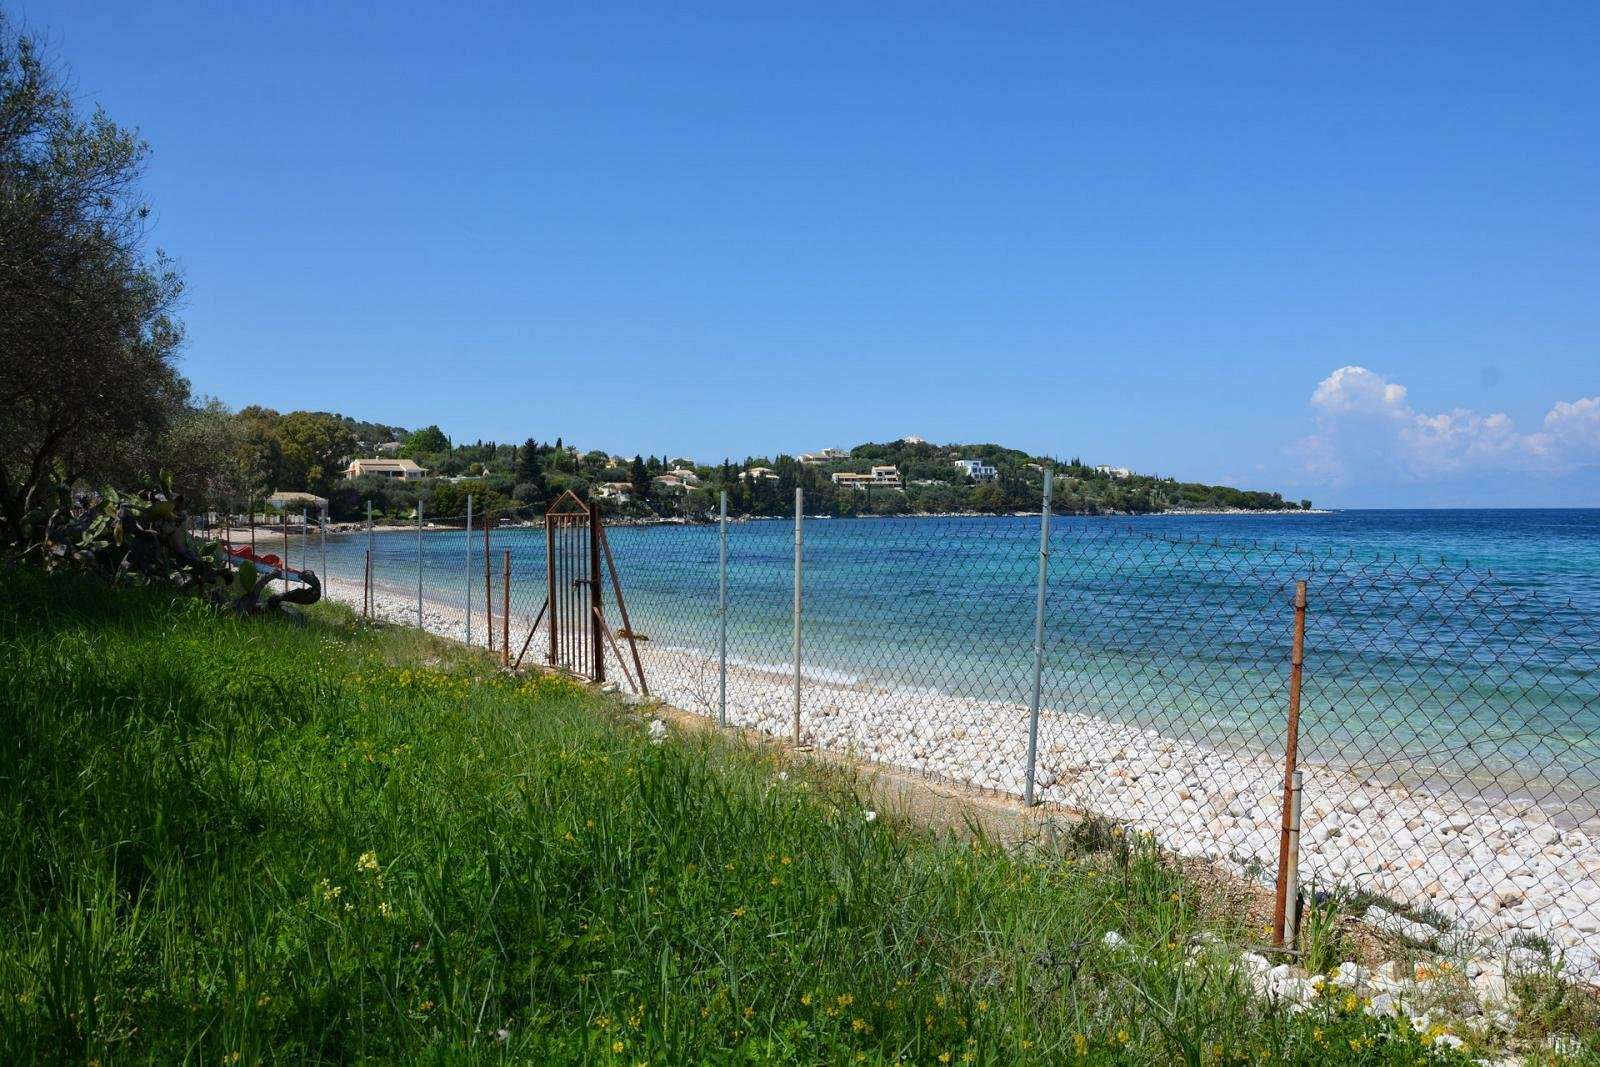 Land in Greece 1